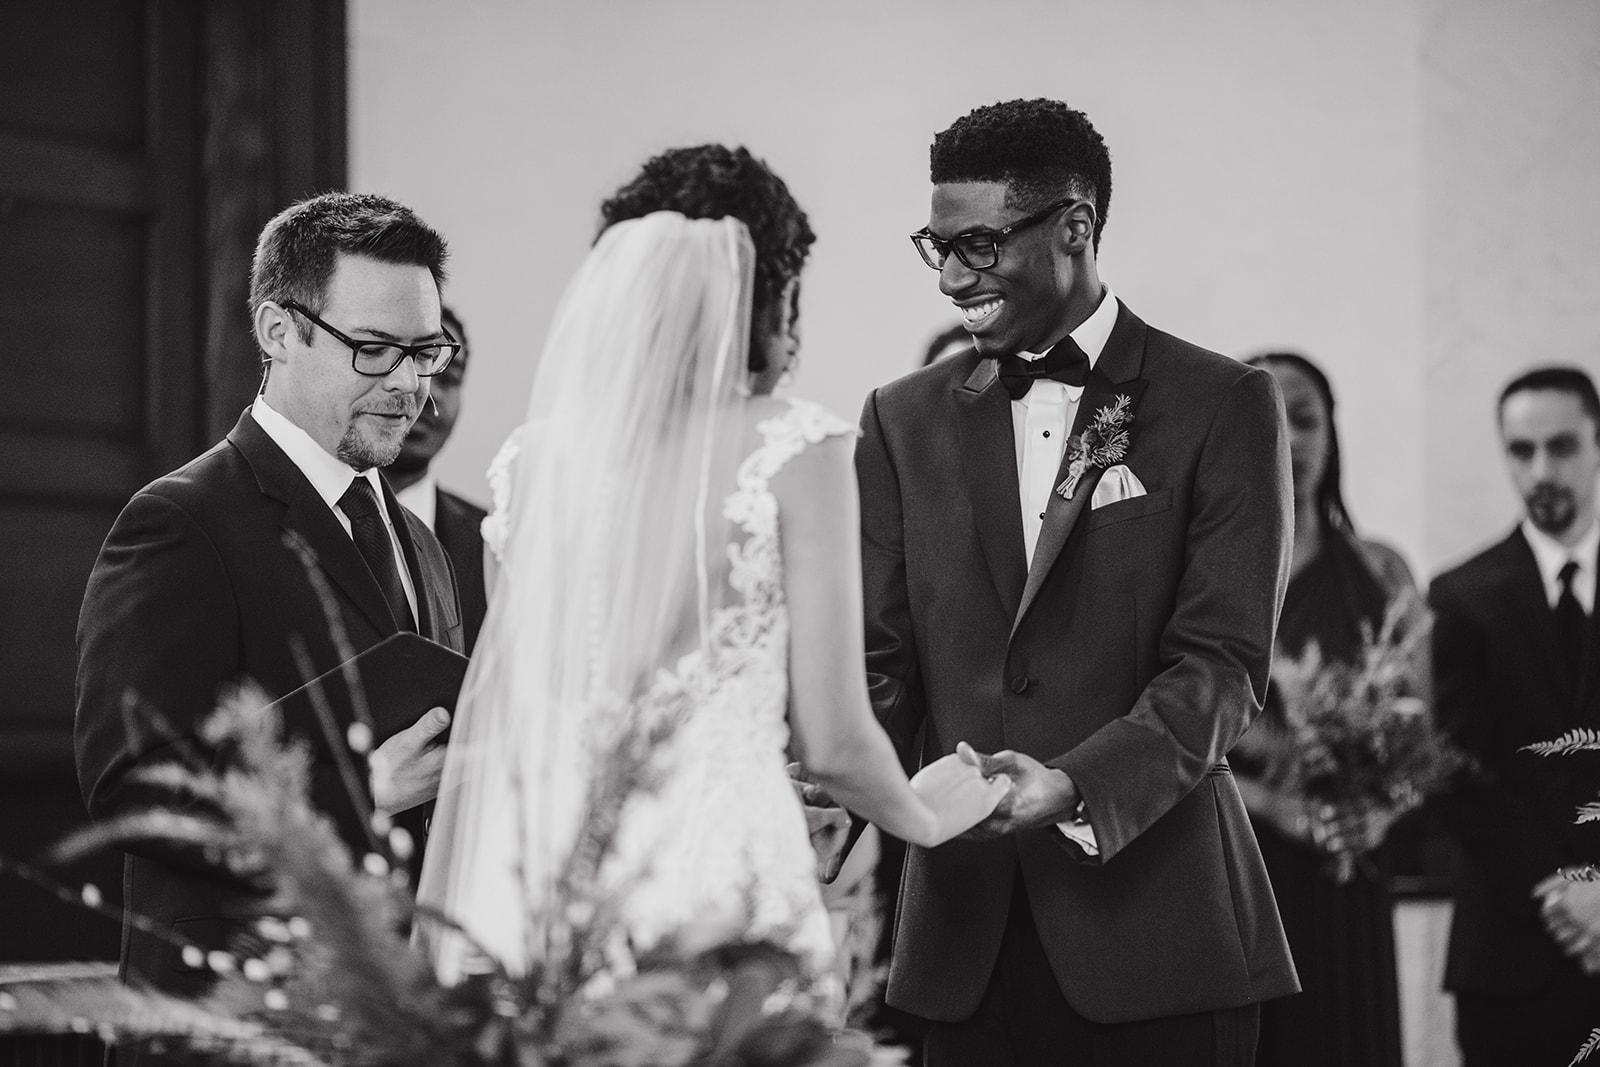 portland - wedding - photographer - doorofhopechurch457.jpg